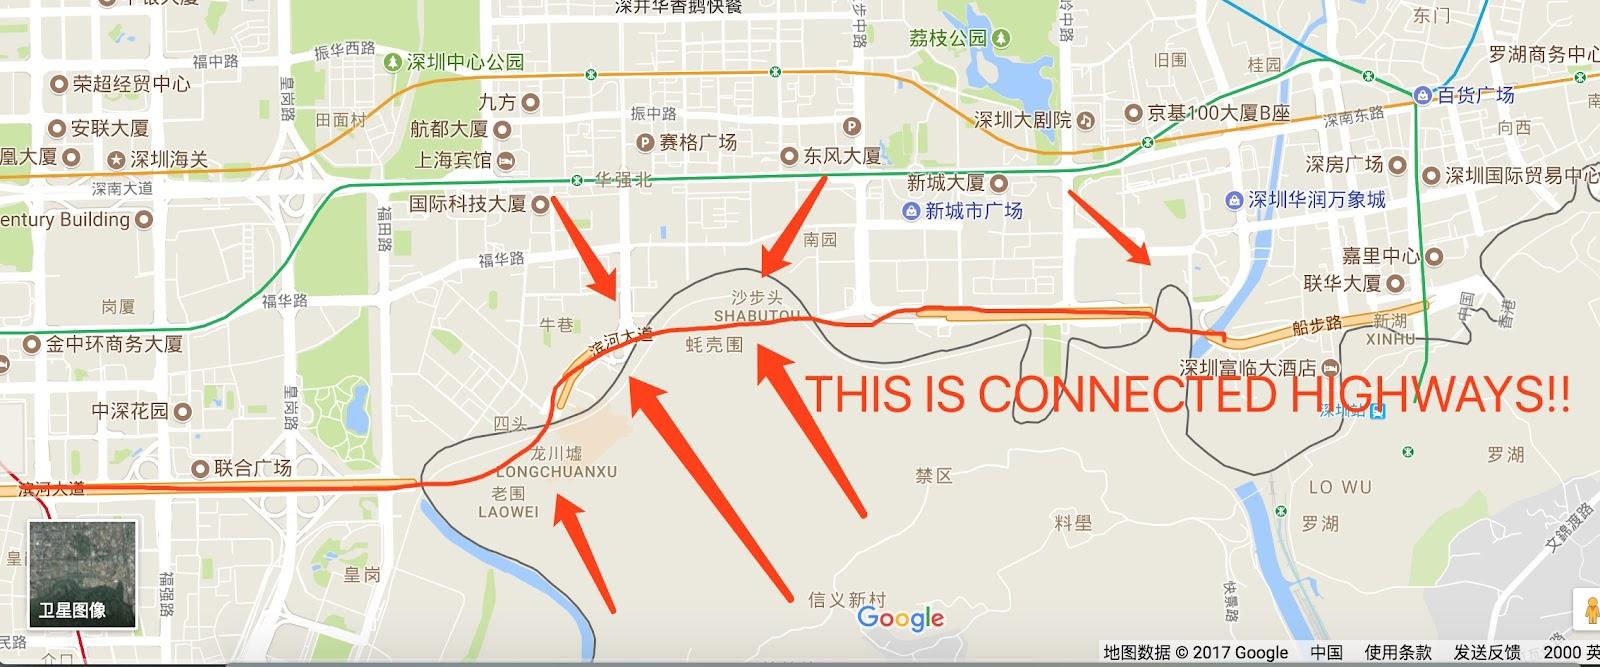 Dating Google Maps bilder